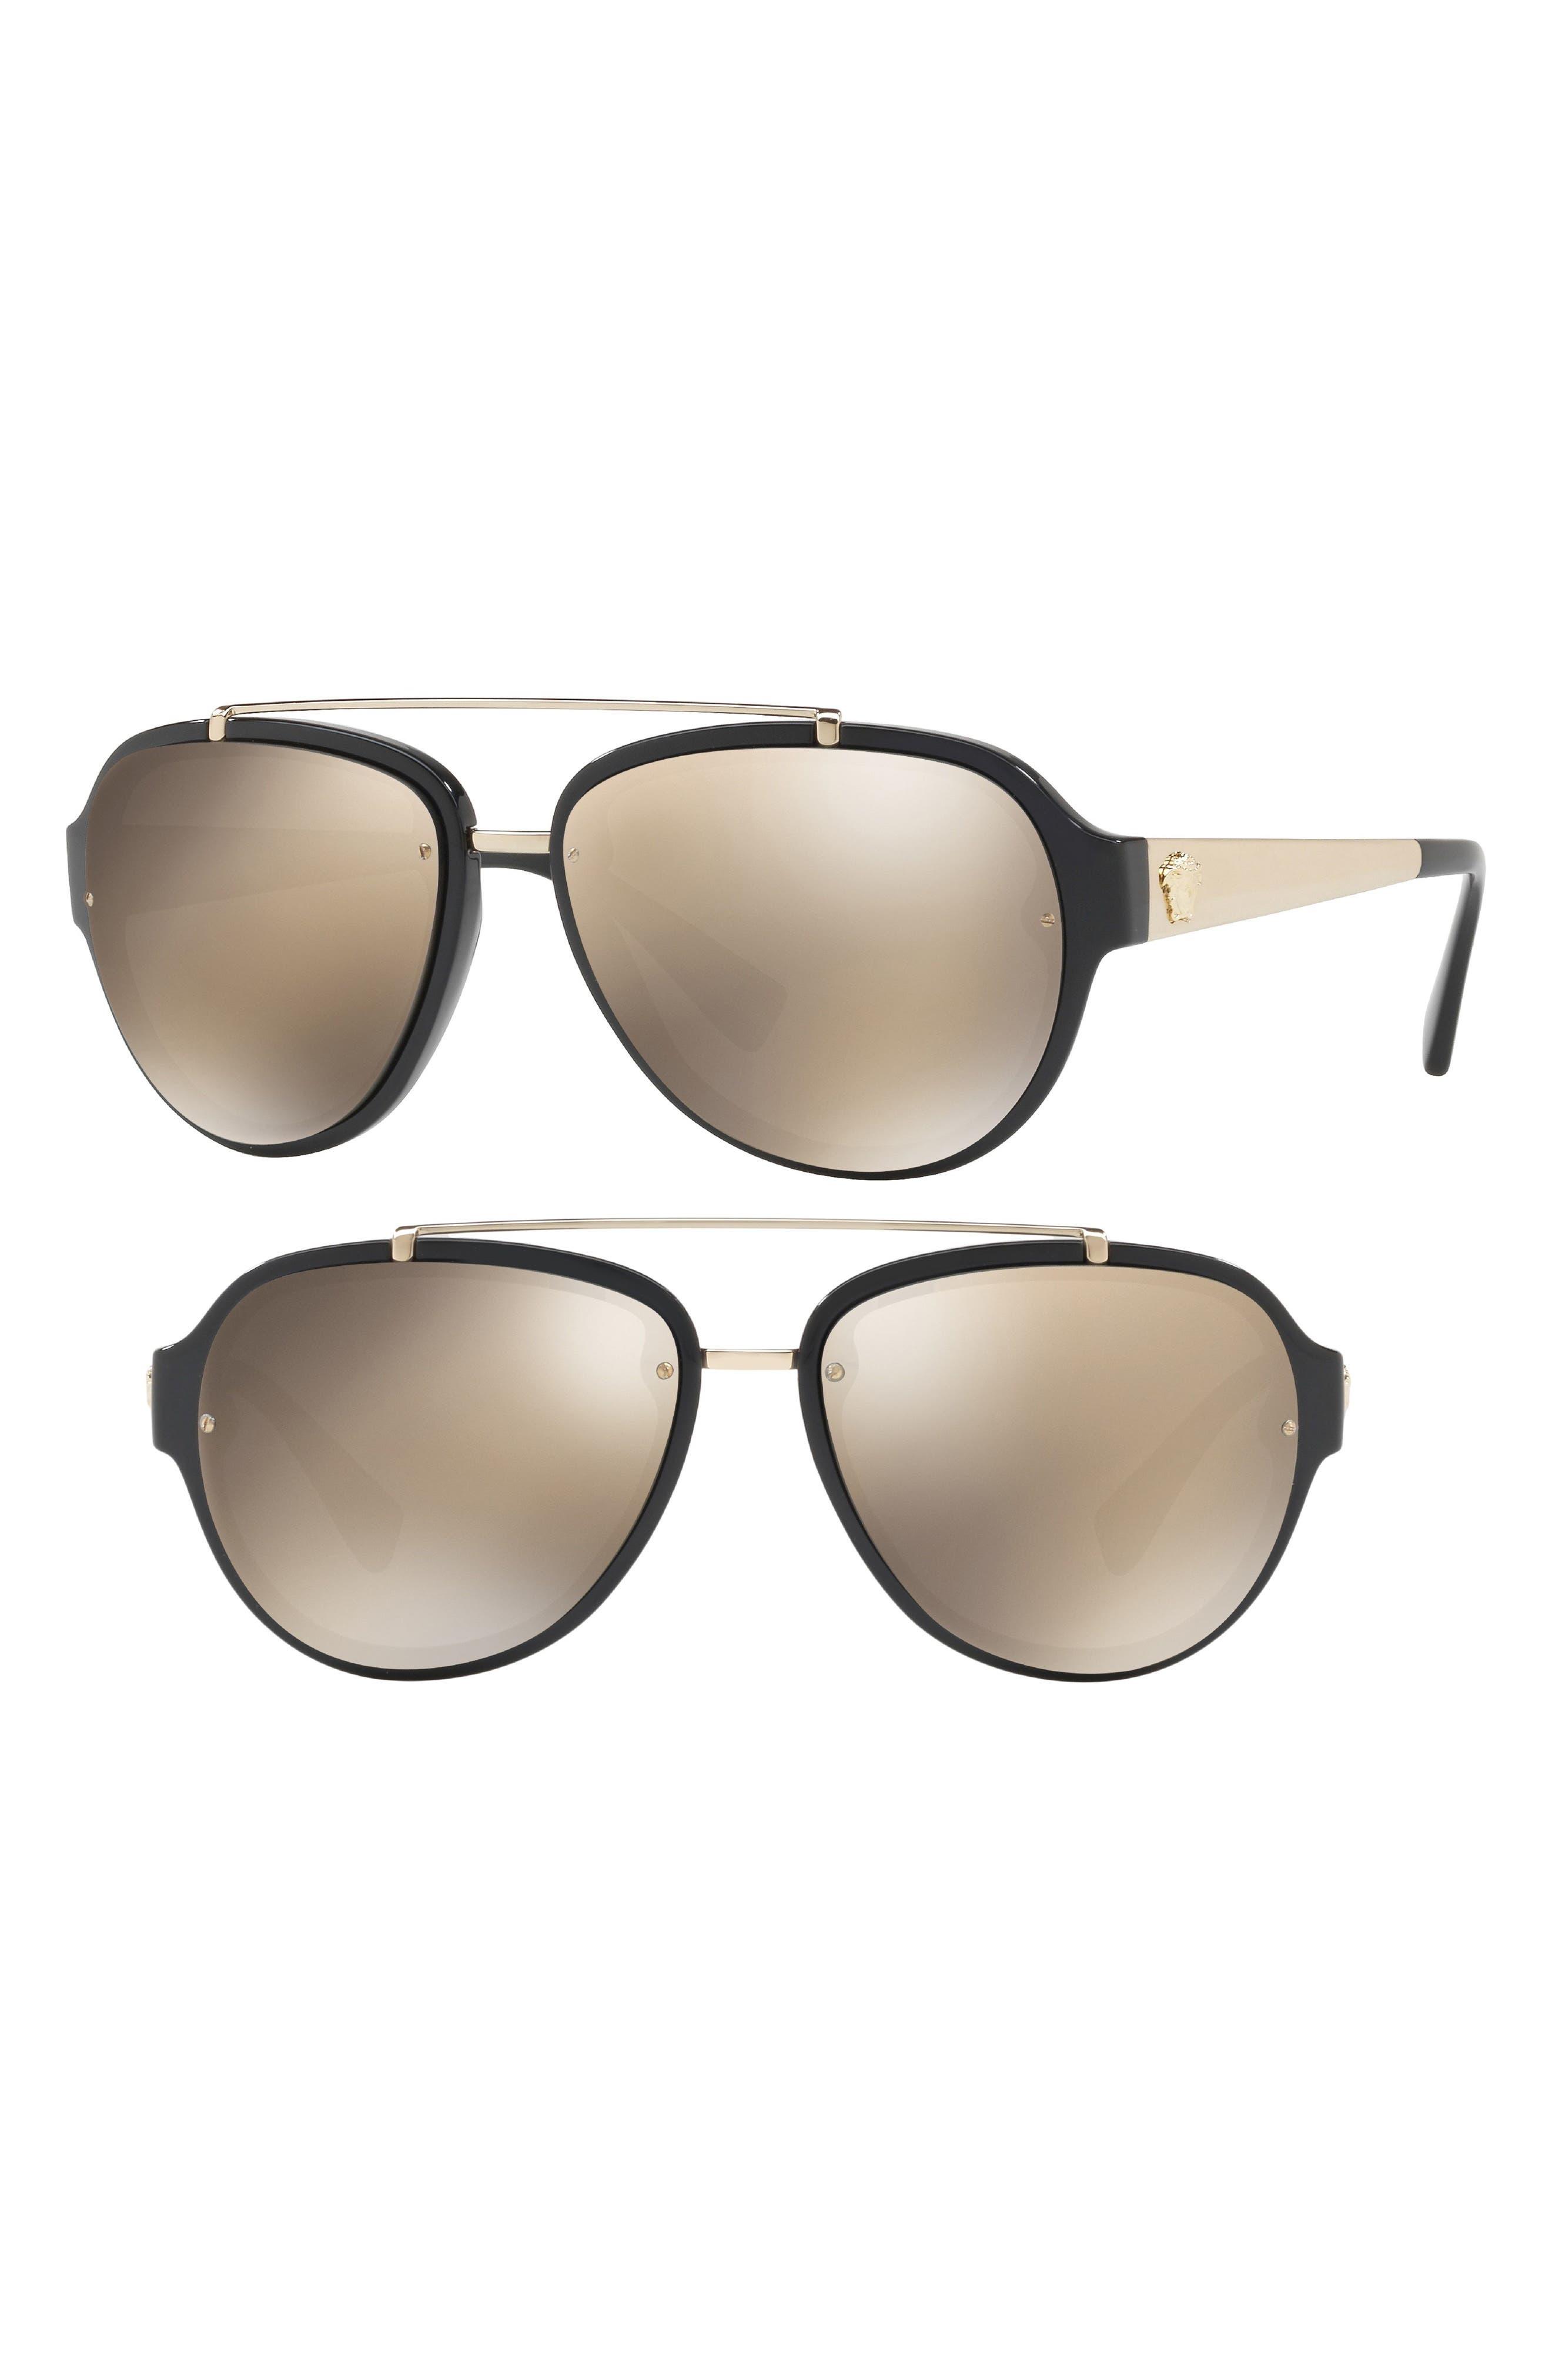 57mm Aviator Sunglasses,                             Main thumbnail 1, color,                             BLACK/ BROWN